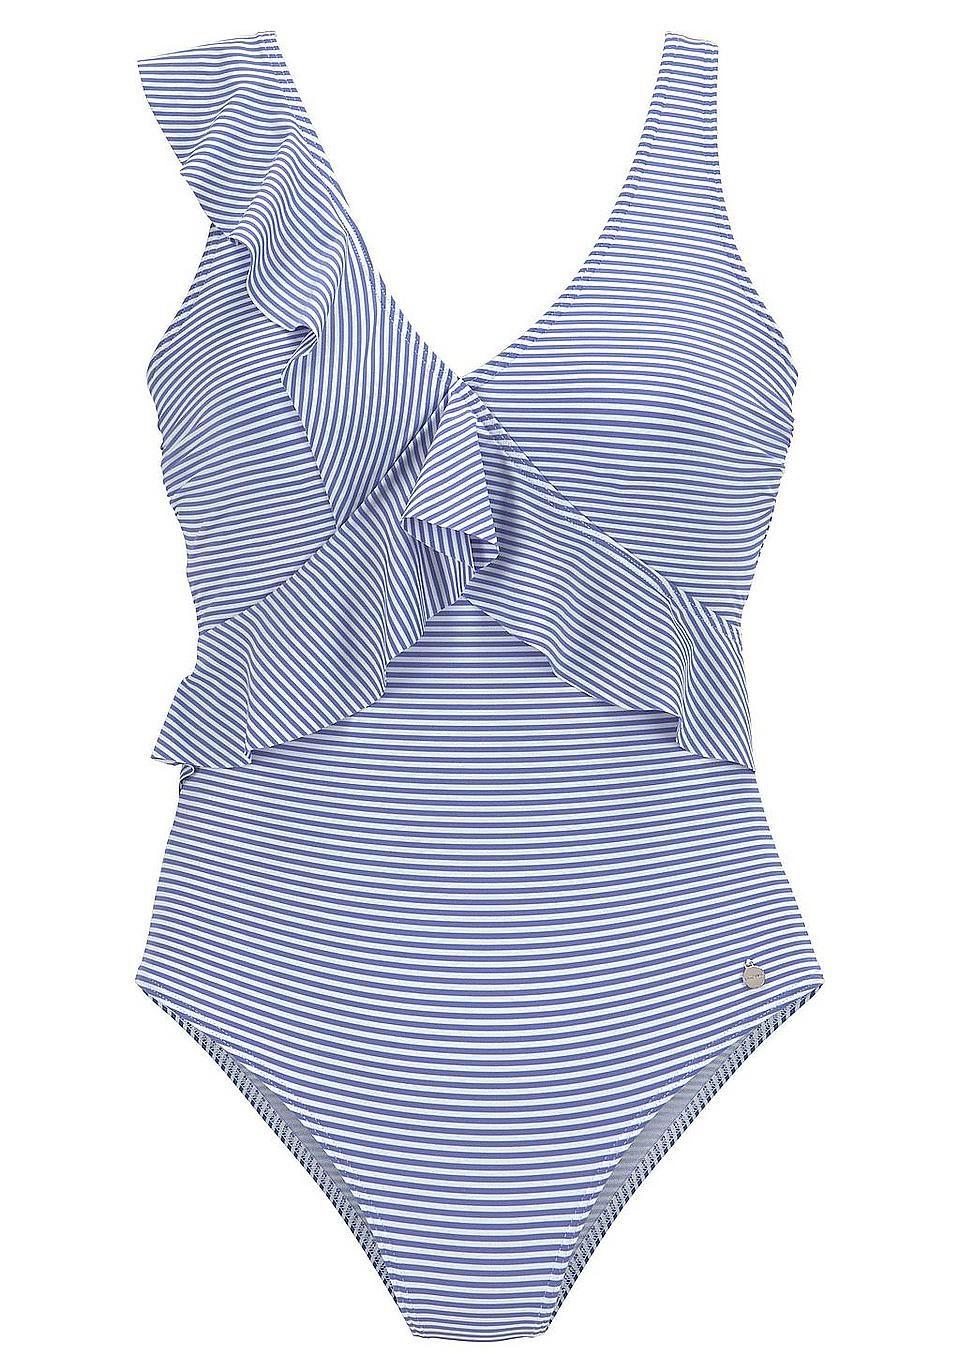 buy popular 69d3d 6c098 LASCANA Badeanzug online bestellen | Strandmode/Bademode ...